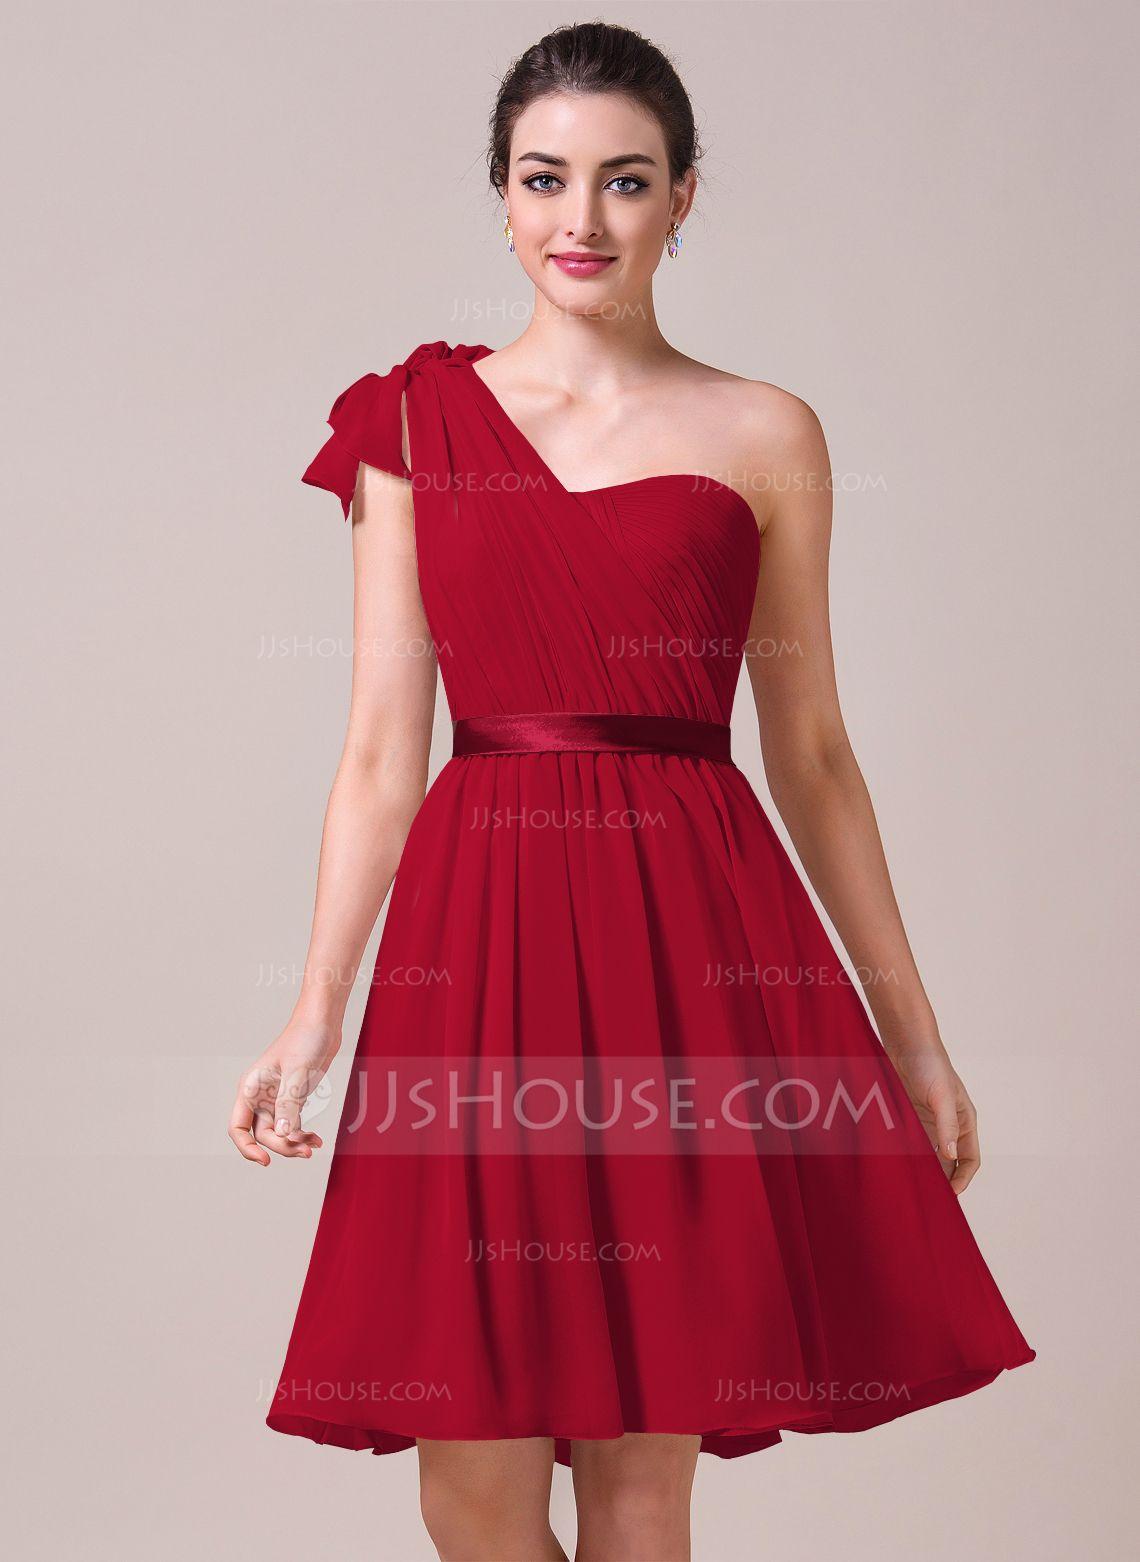 aef90c9cad53e A-Line/Princess Sweetheart Knee-Length Chiffon Charmeuse Bridesmaid Dress  With Ruffle Bow(s) (007057704) - JJsHouse